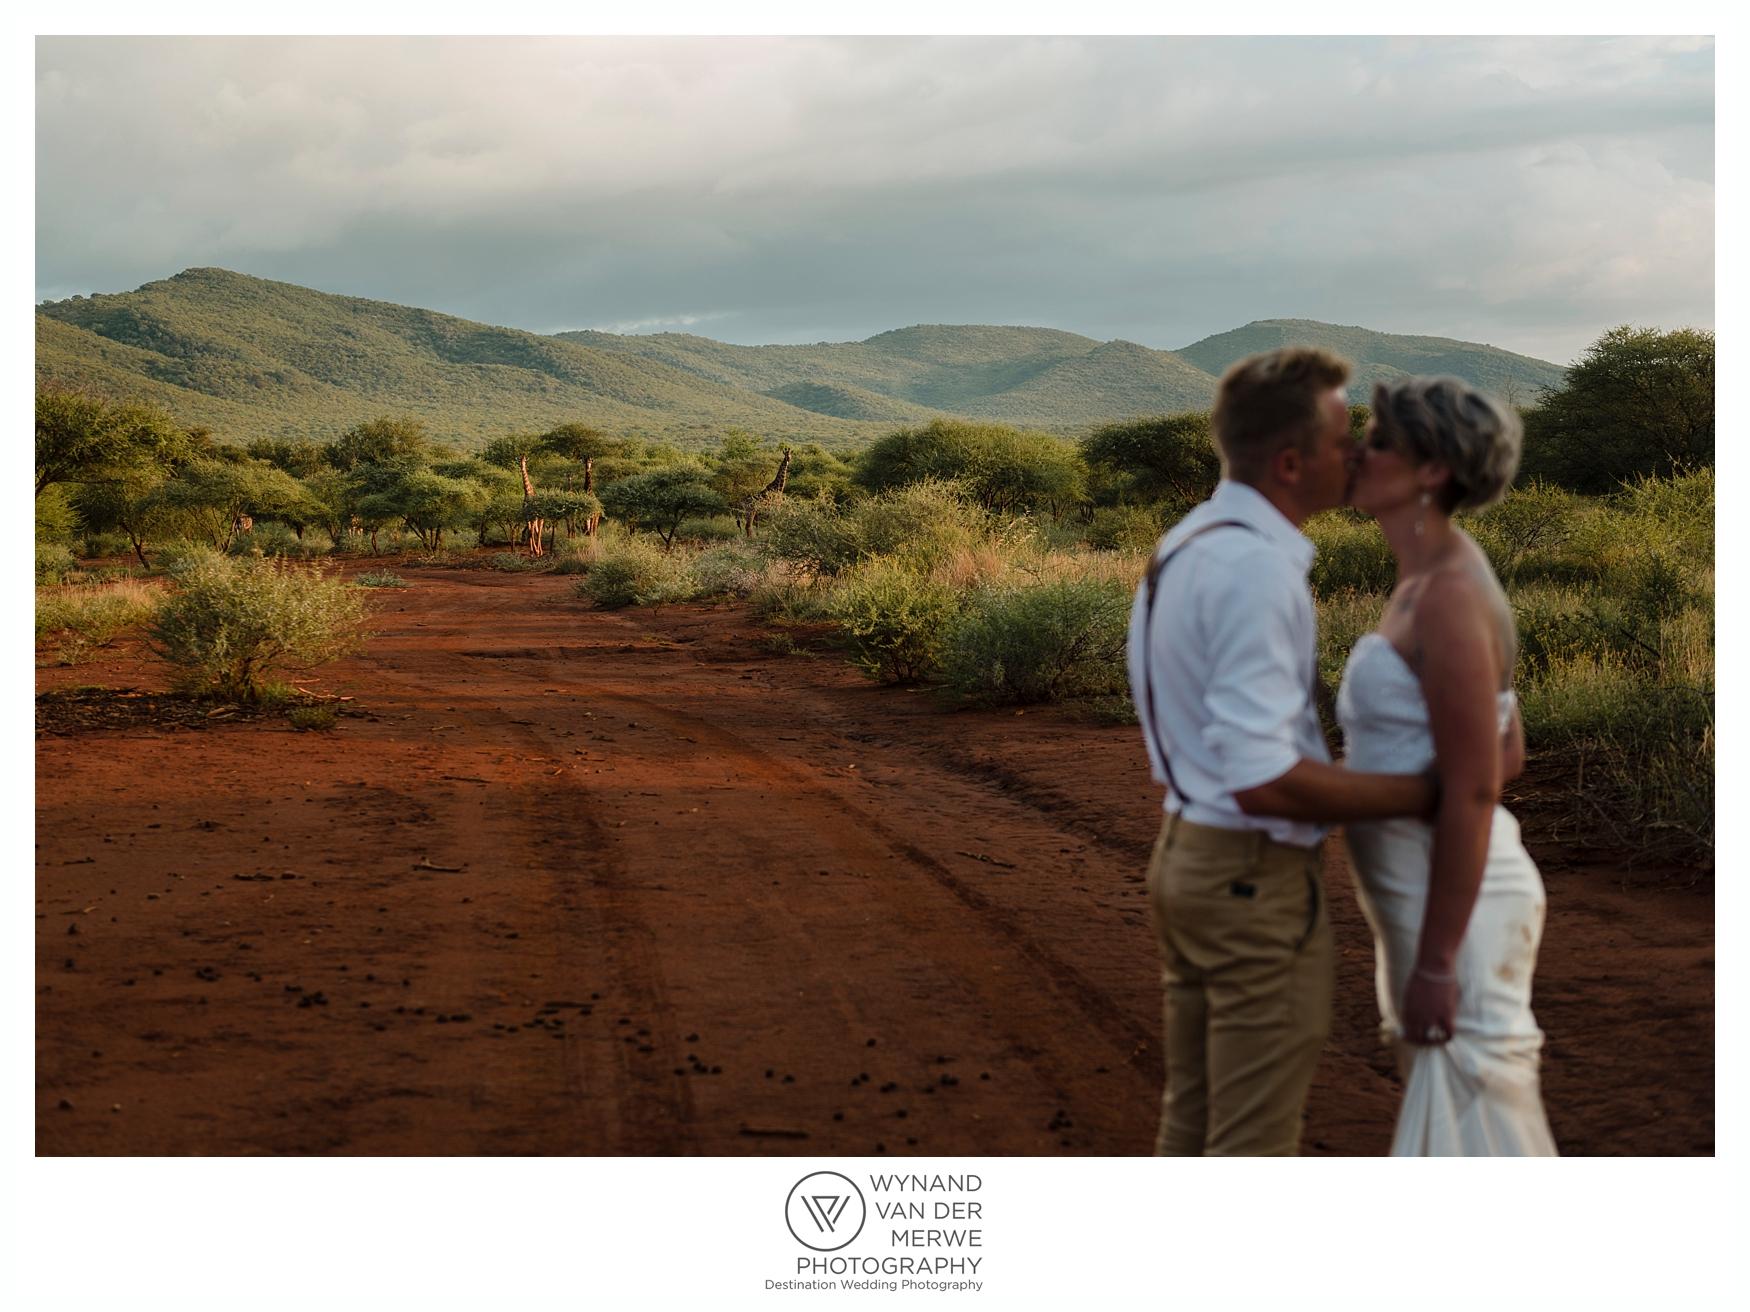 WynandvanderMerwe_weddingphotography_bushveldwedding_northam_bushveld_limpopowedding_limpopo_southafrica-263.jpg